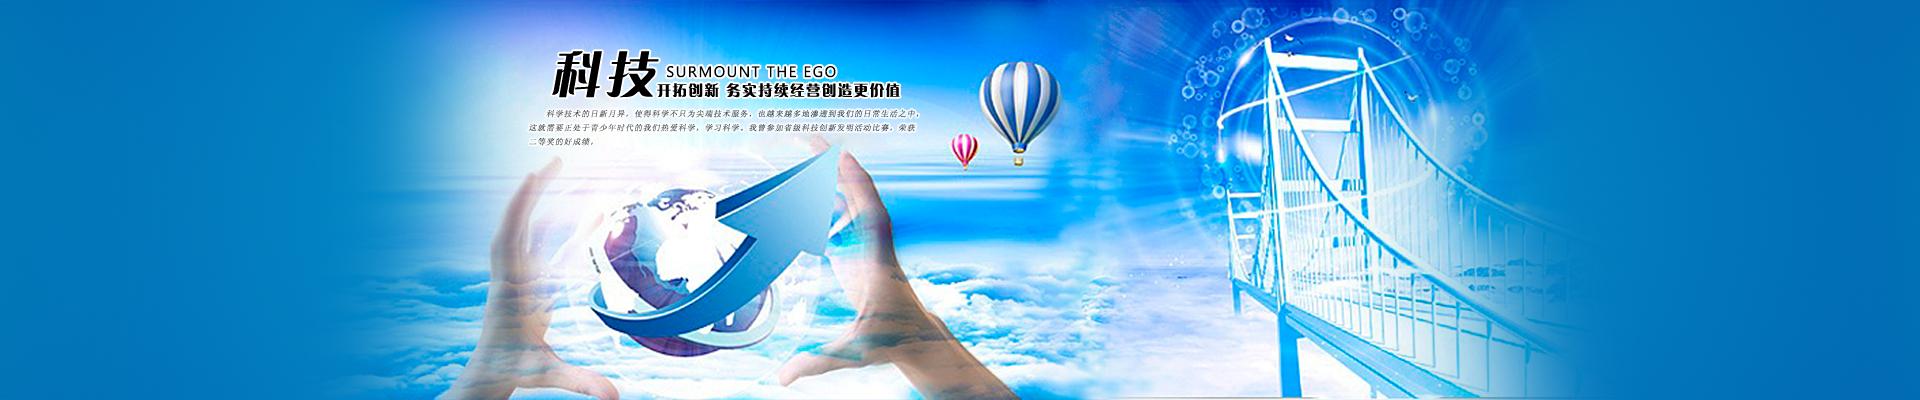 http://www.xtj8.com/img/banner_xwzx.jpg_banner